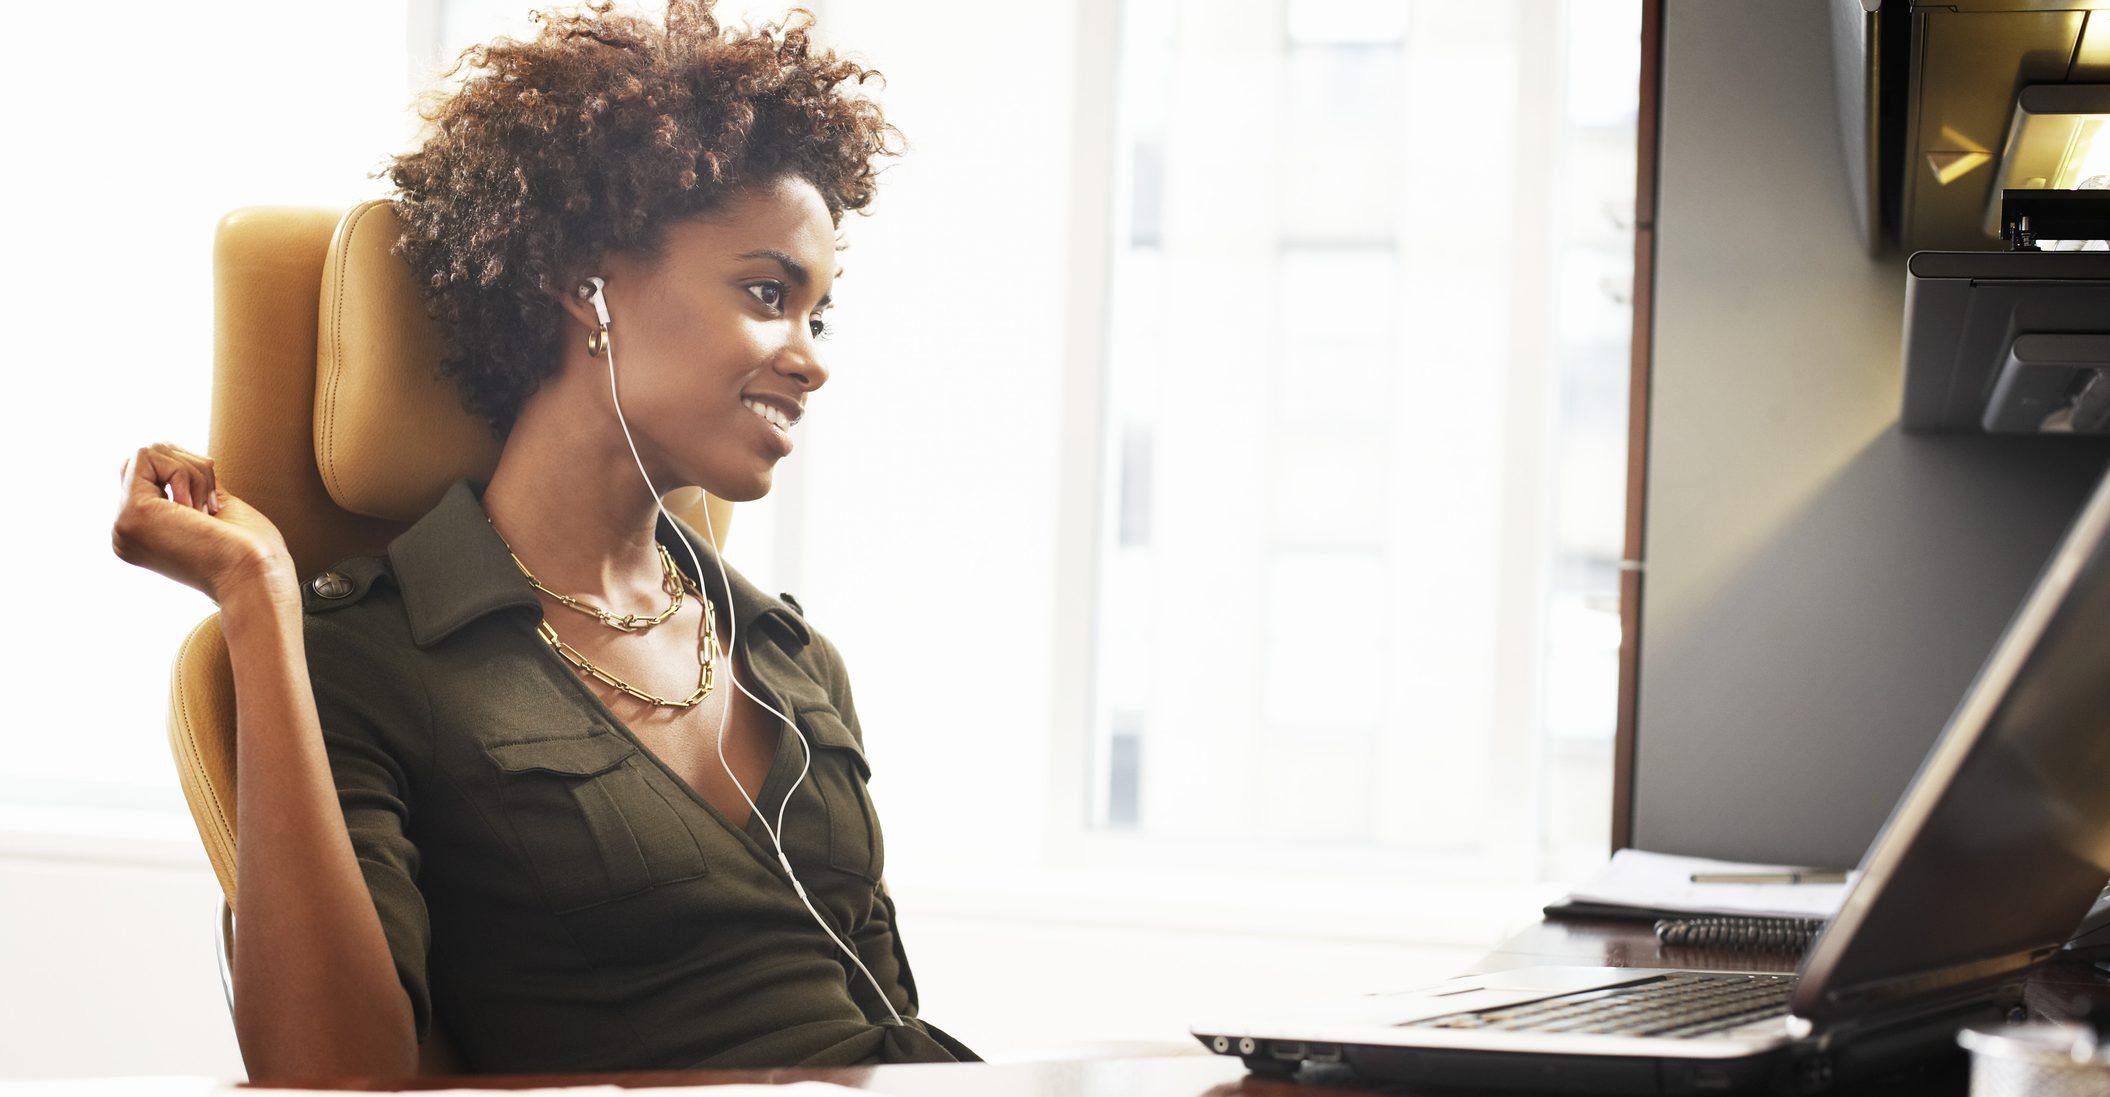 Businesswoman at desk wearing earphones, smiling